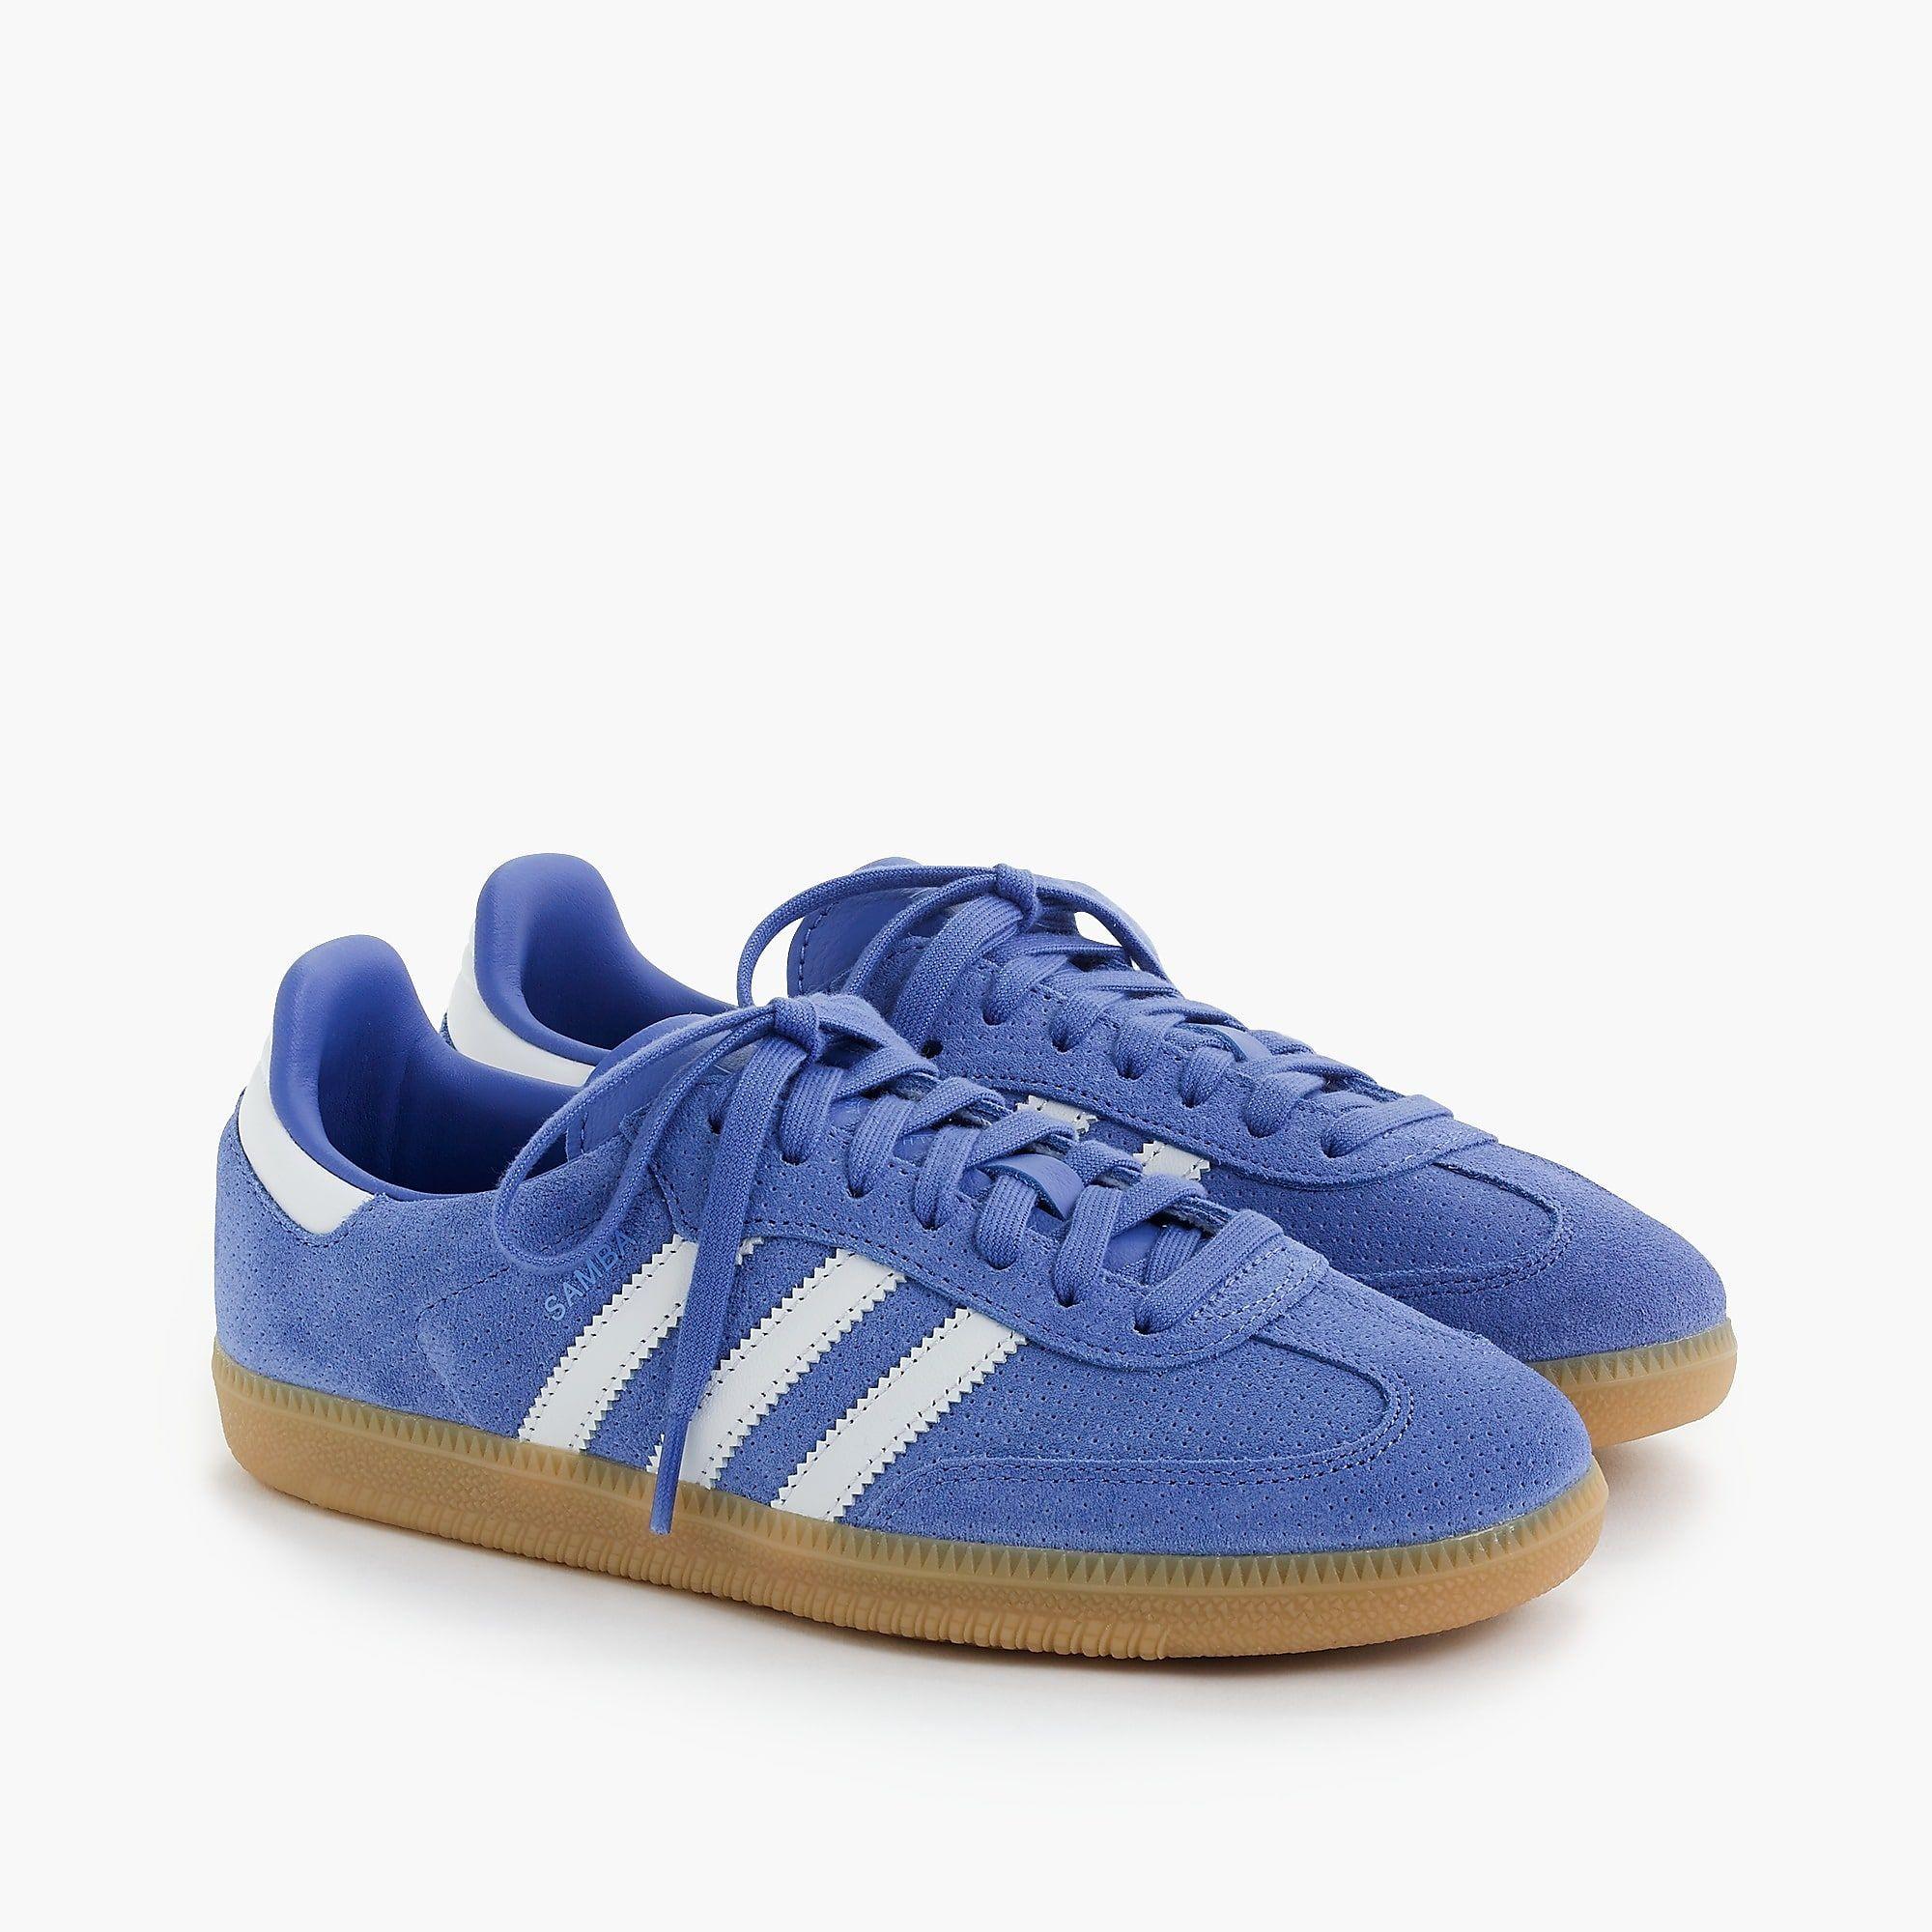 e48892c1211f Adidas Samba sneakers in Periwinkle